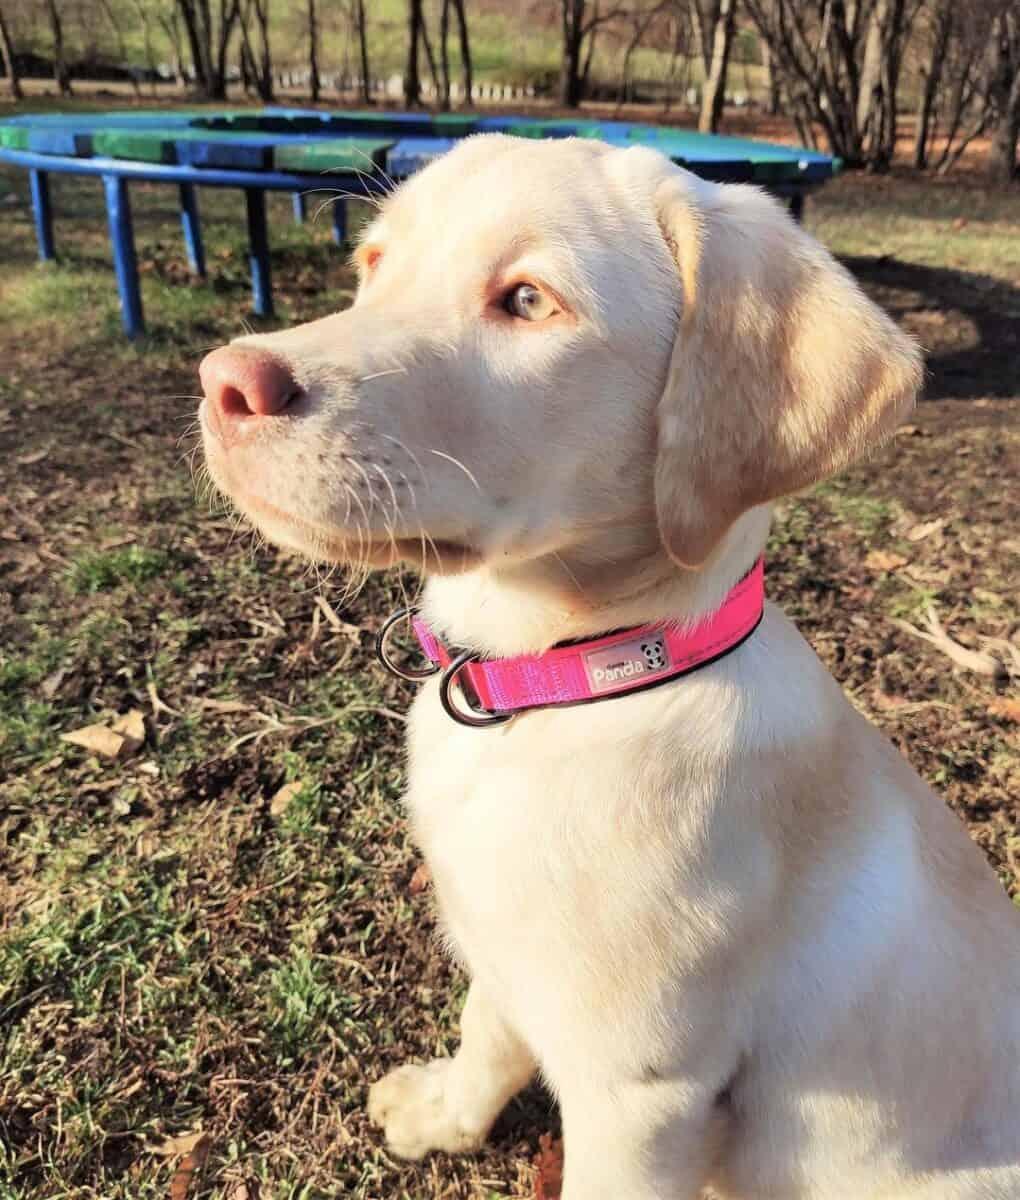 Dudley Labrador puppy in a park